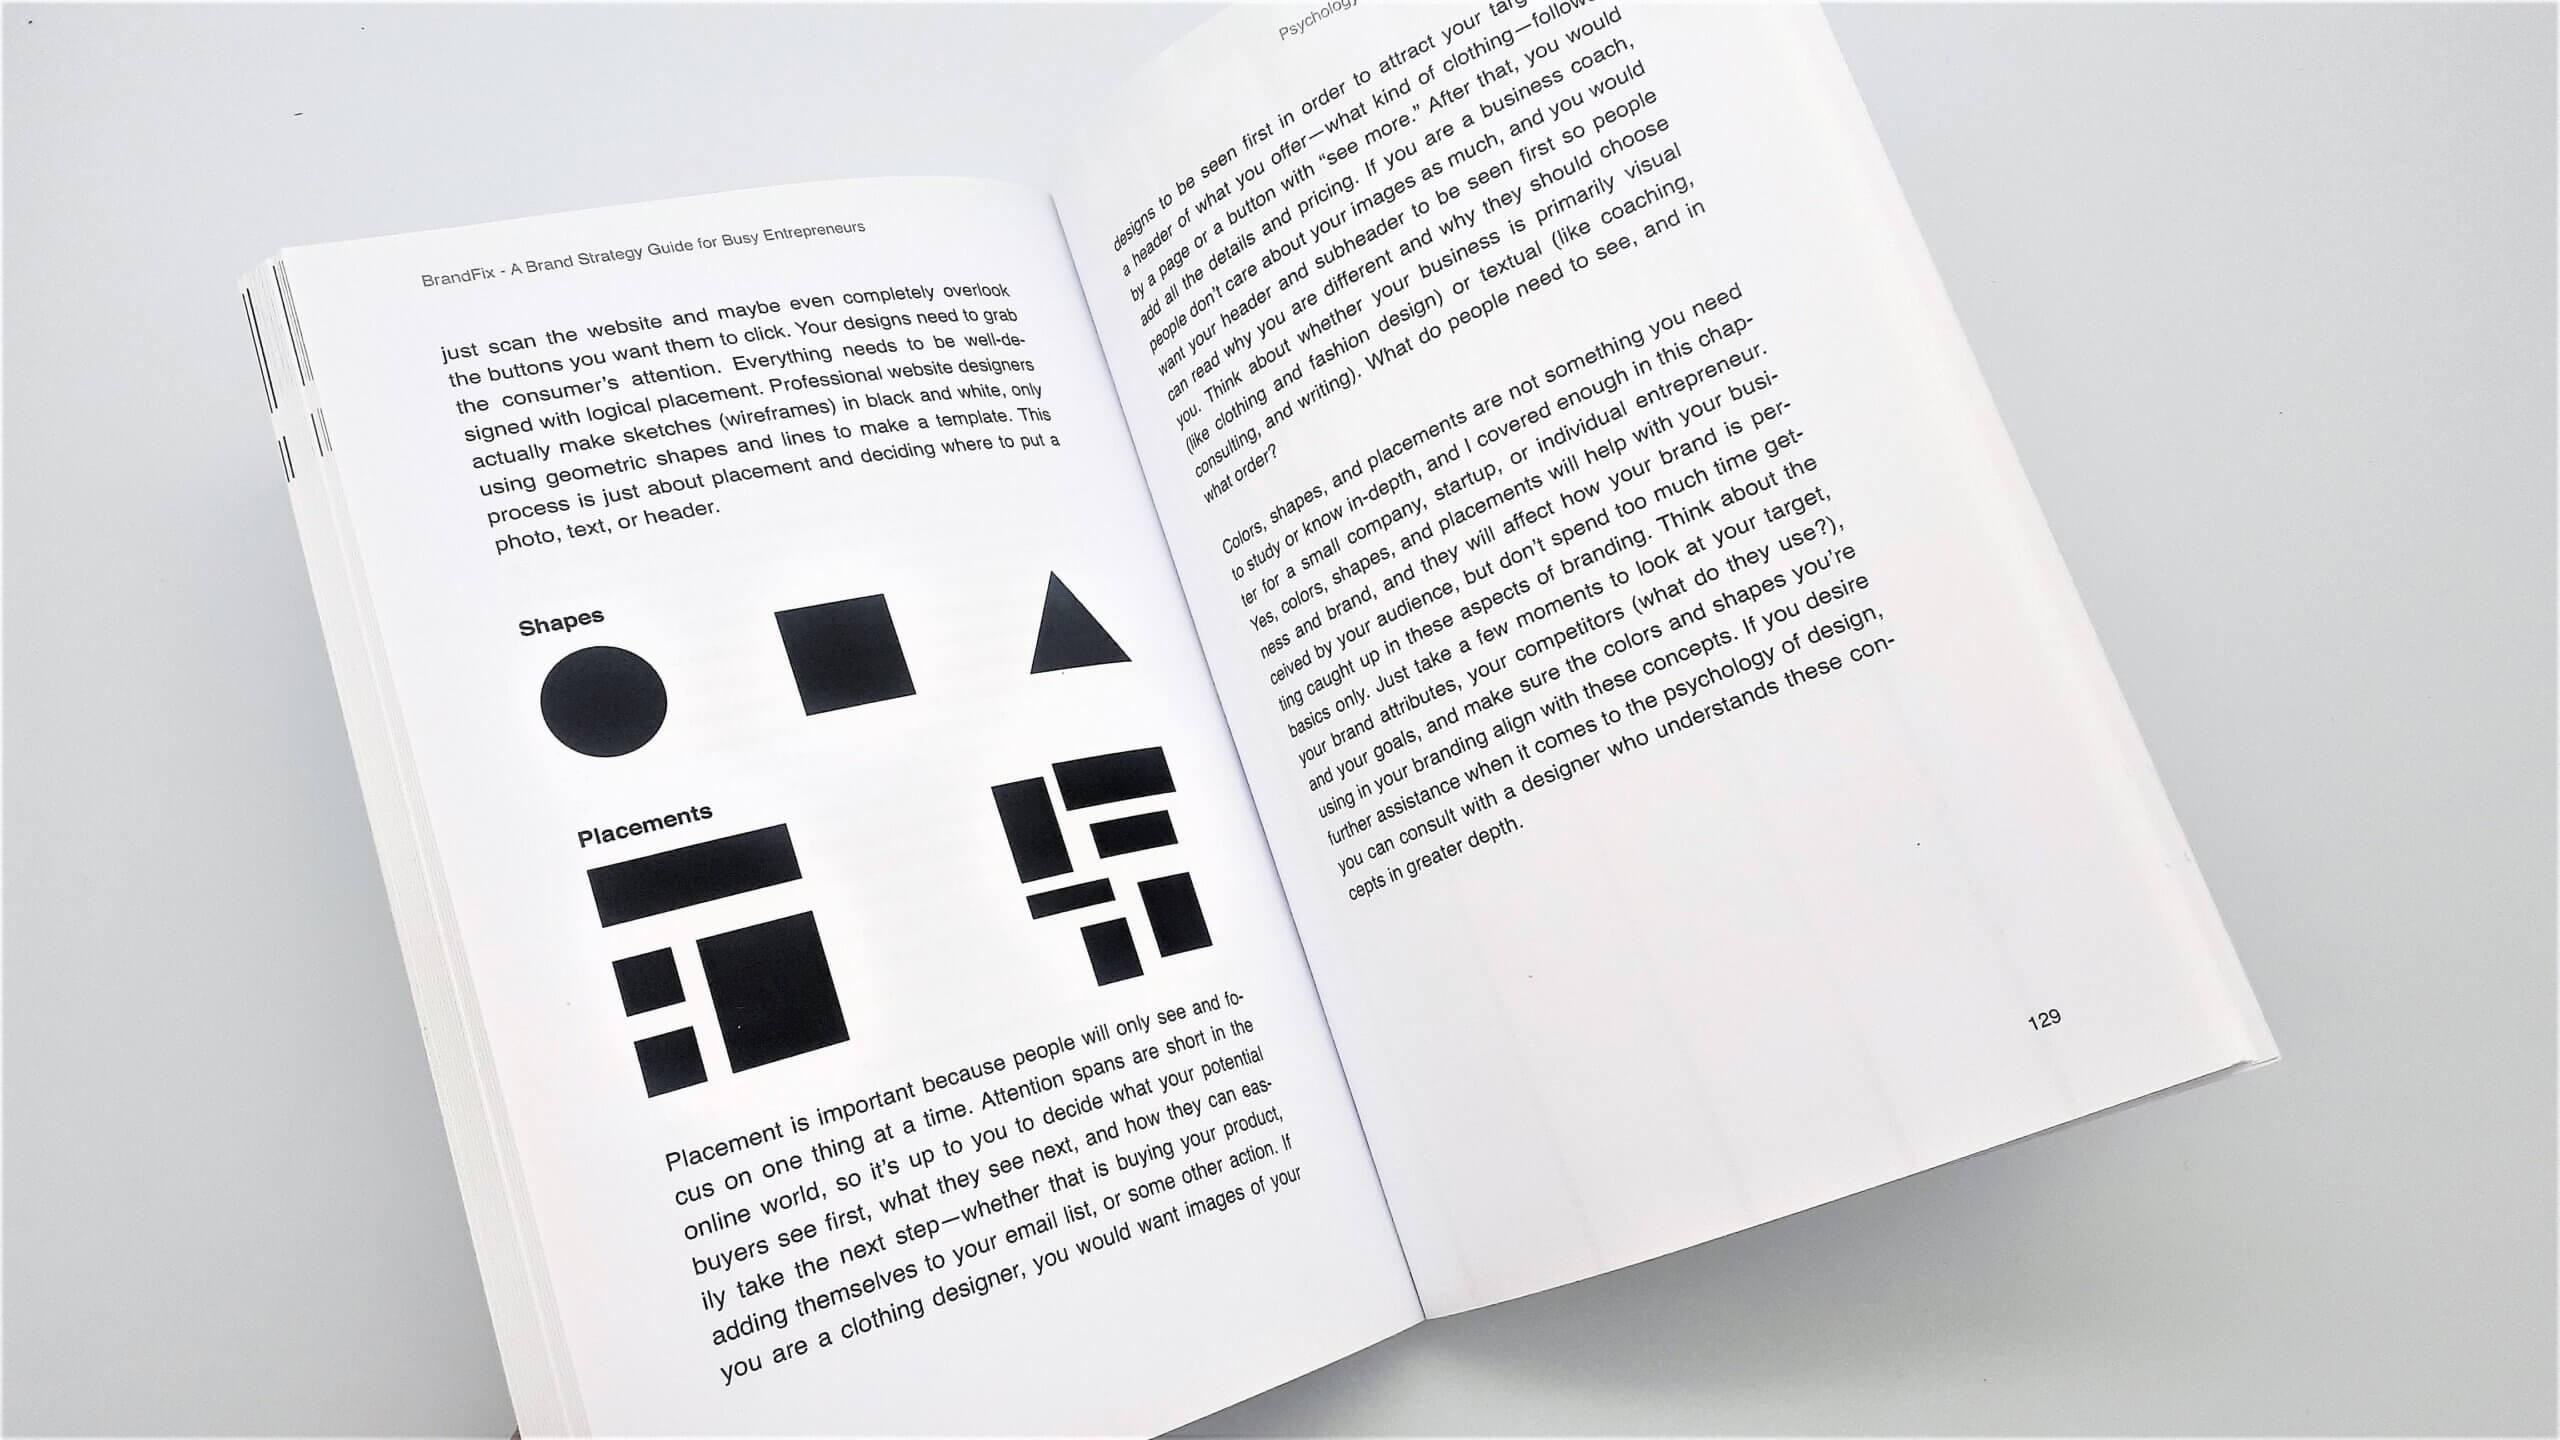 BrandFix by Kady Sandel - Book Review 8